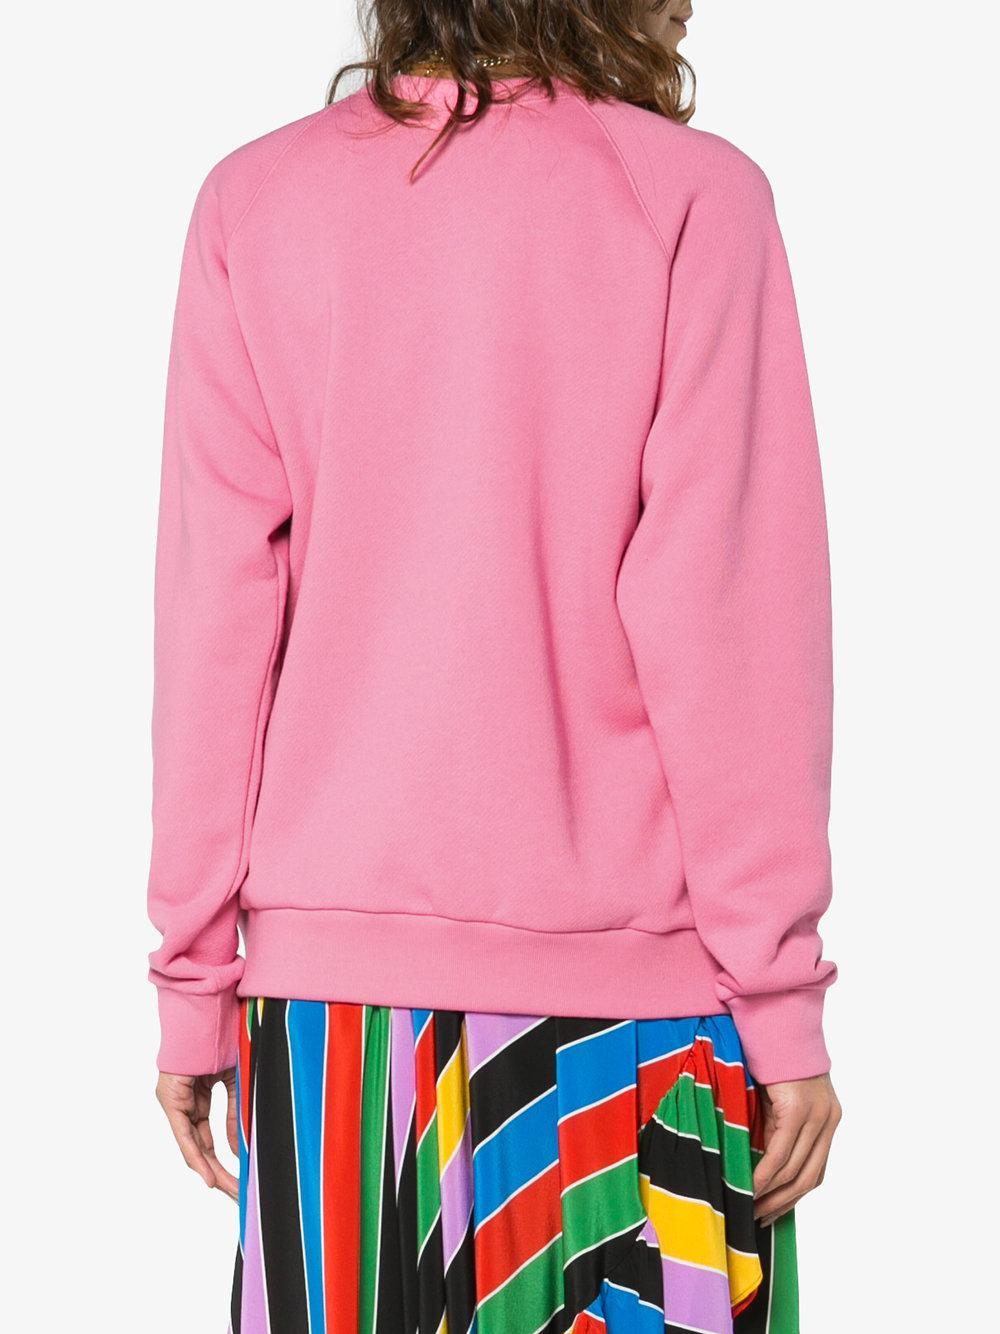 Gucci Cat Sweatshirt in Pink - Lyst